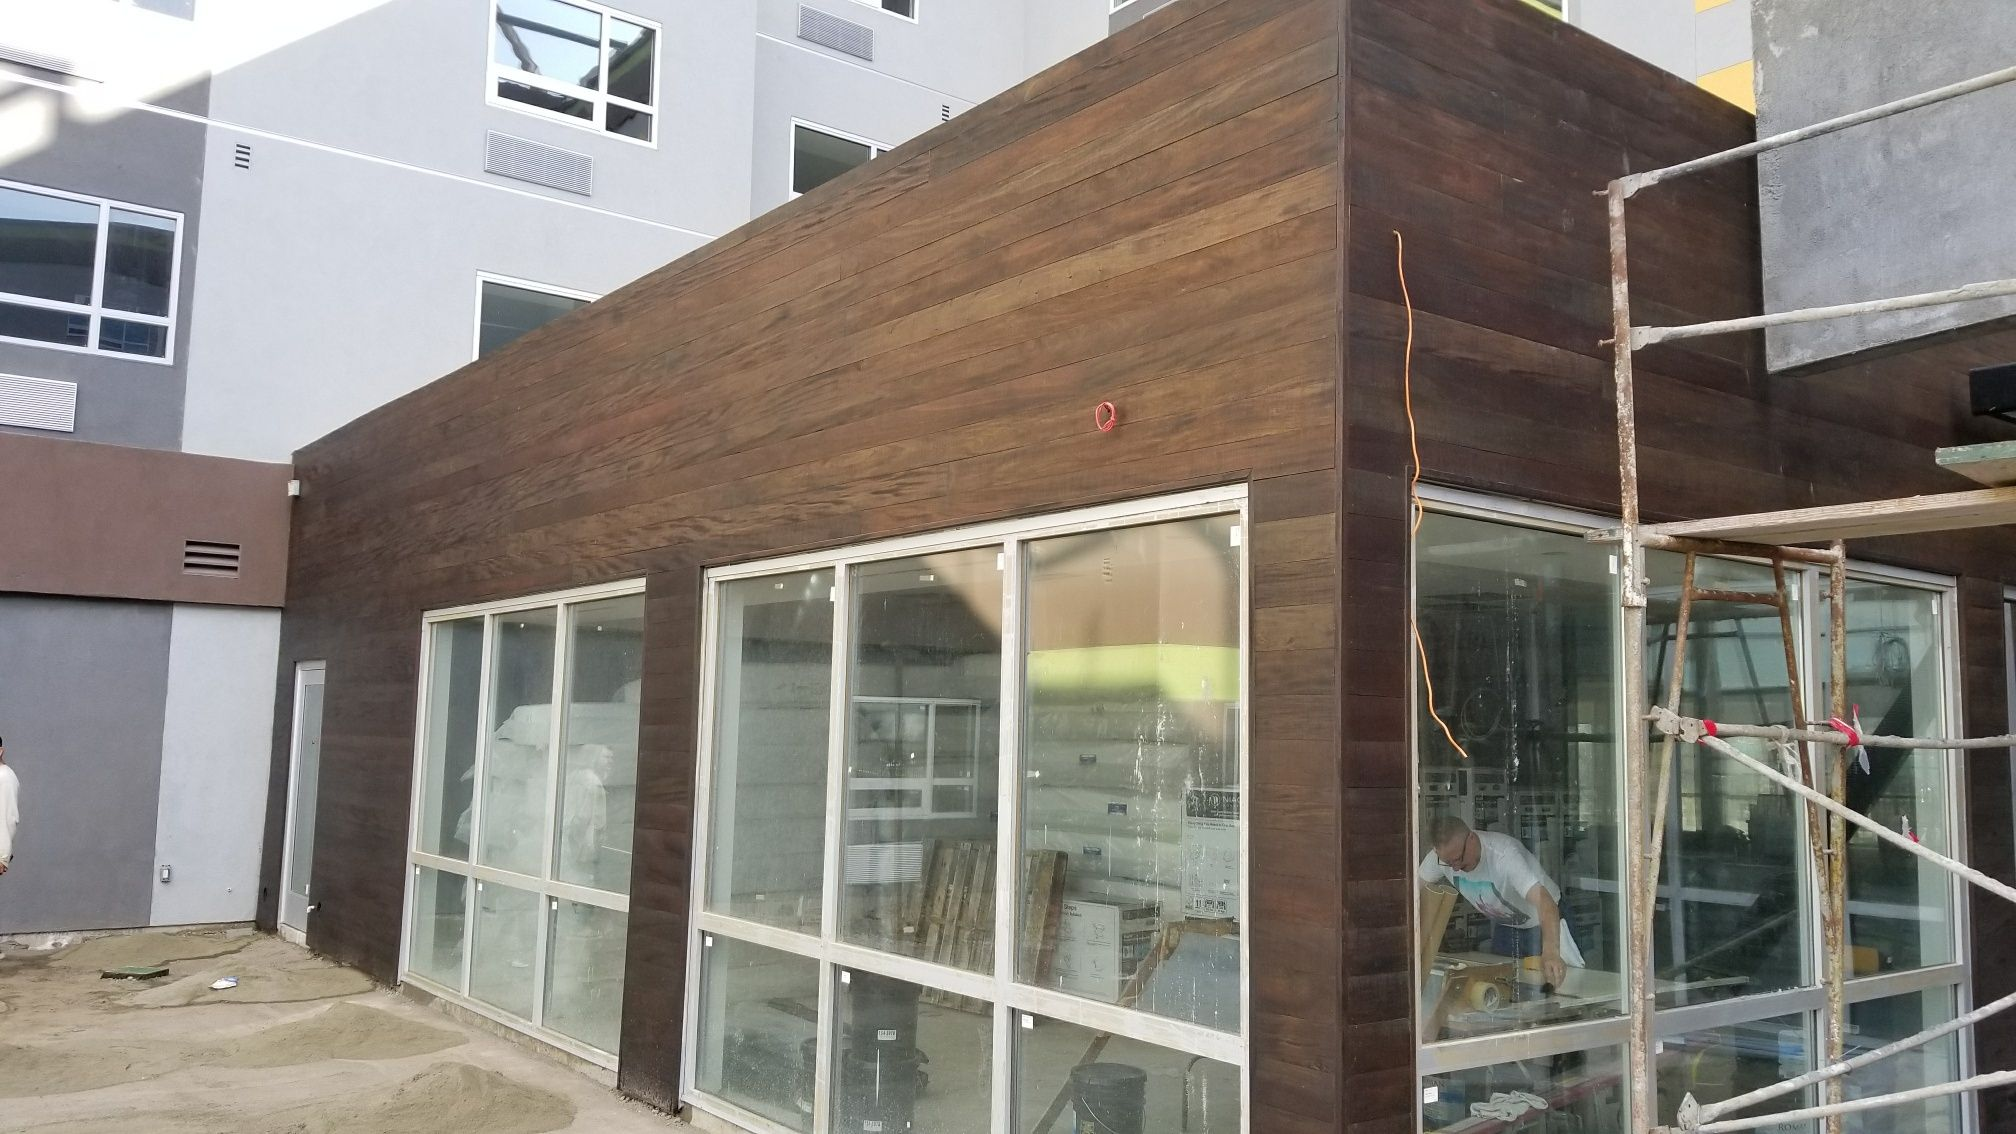 Mahogany Siding Hardwood Decking And Lumber Suppliers